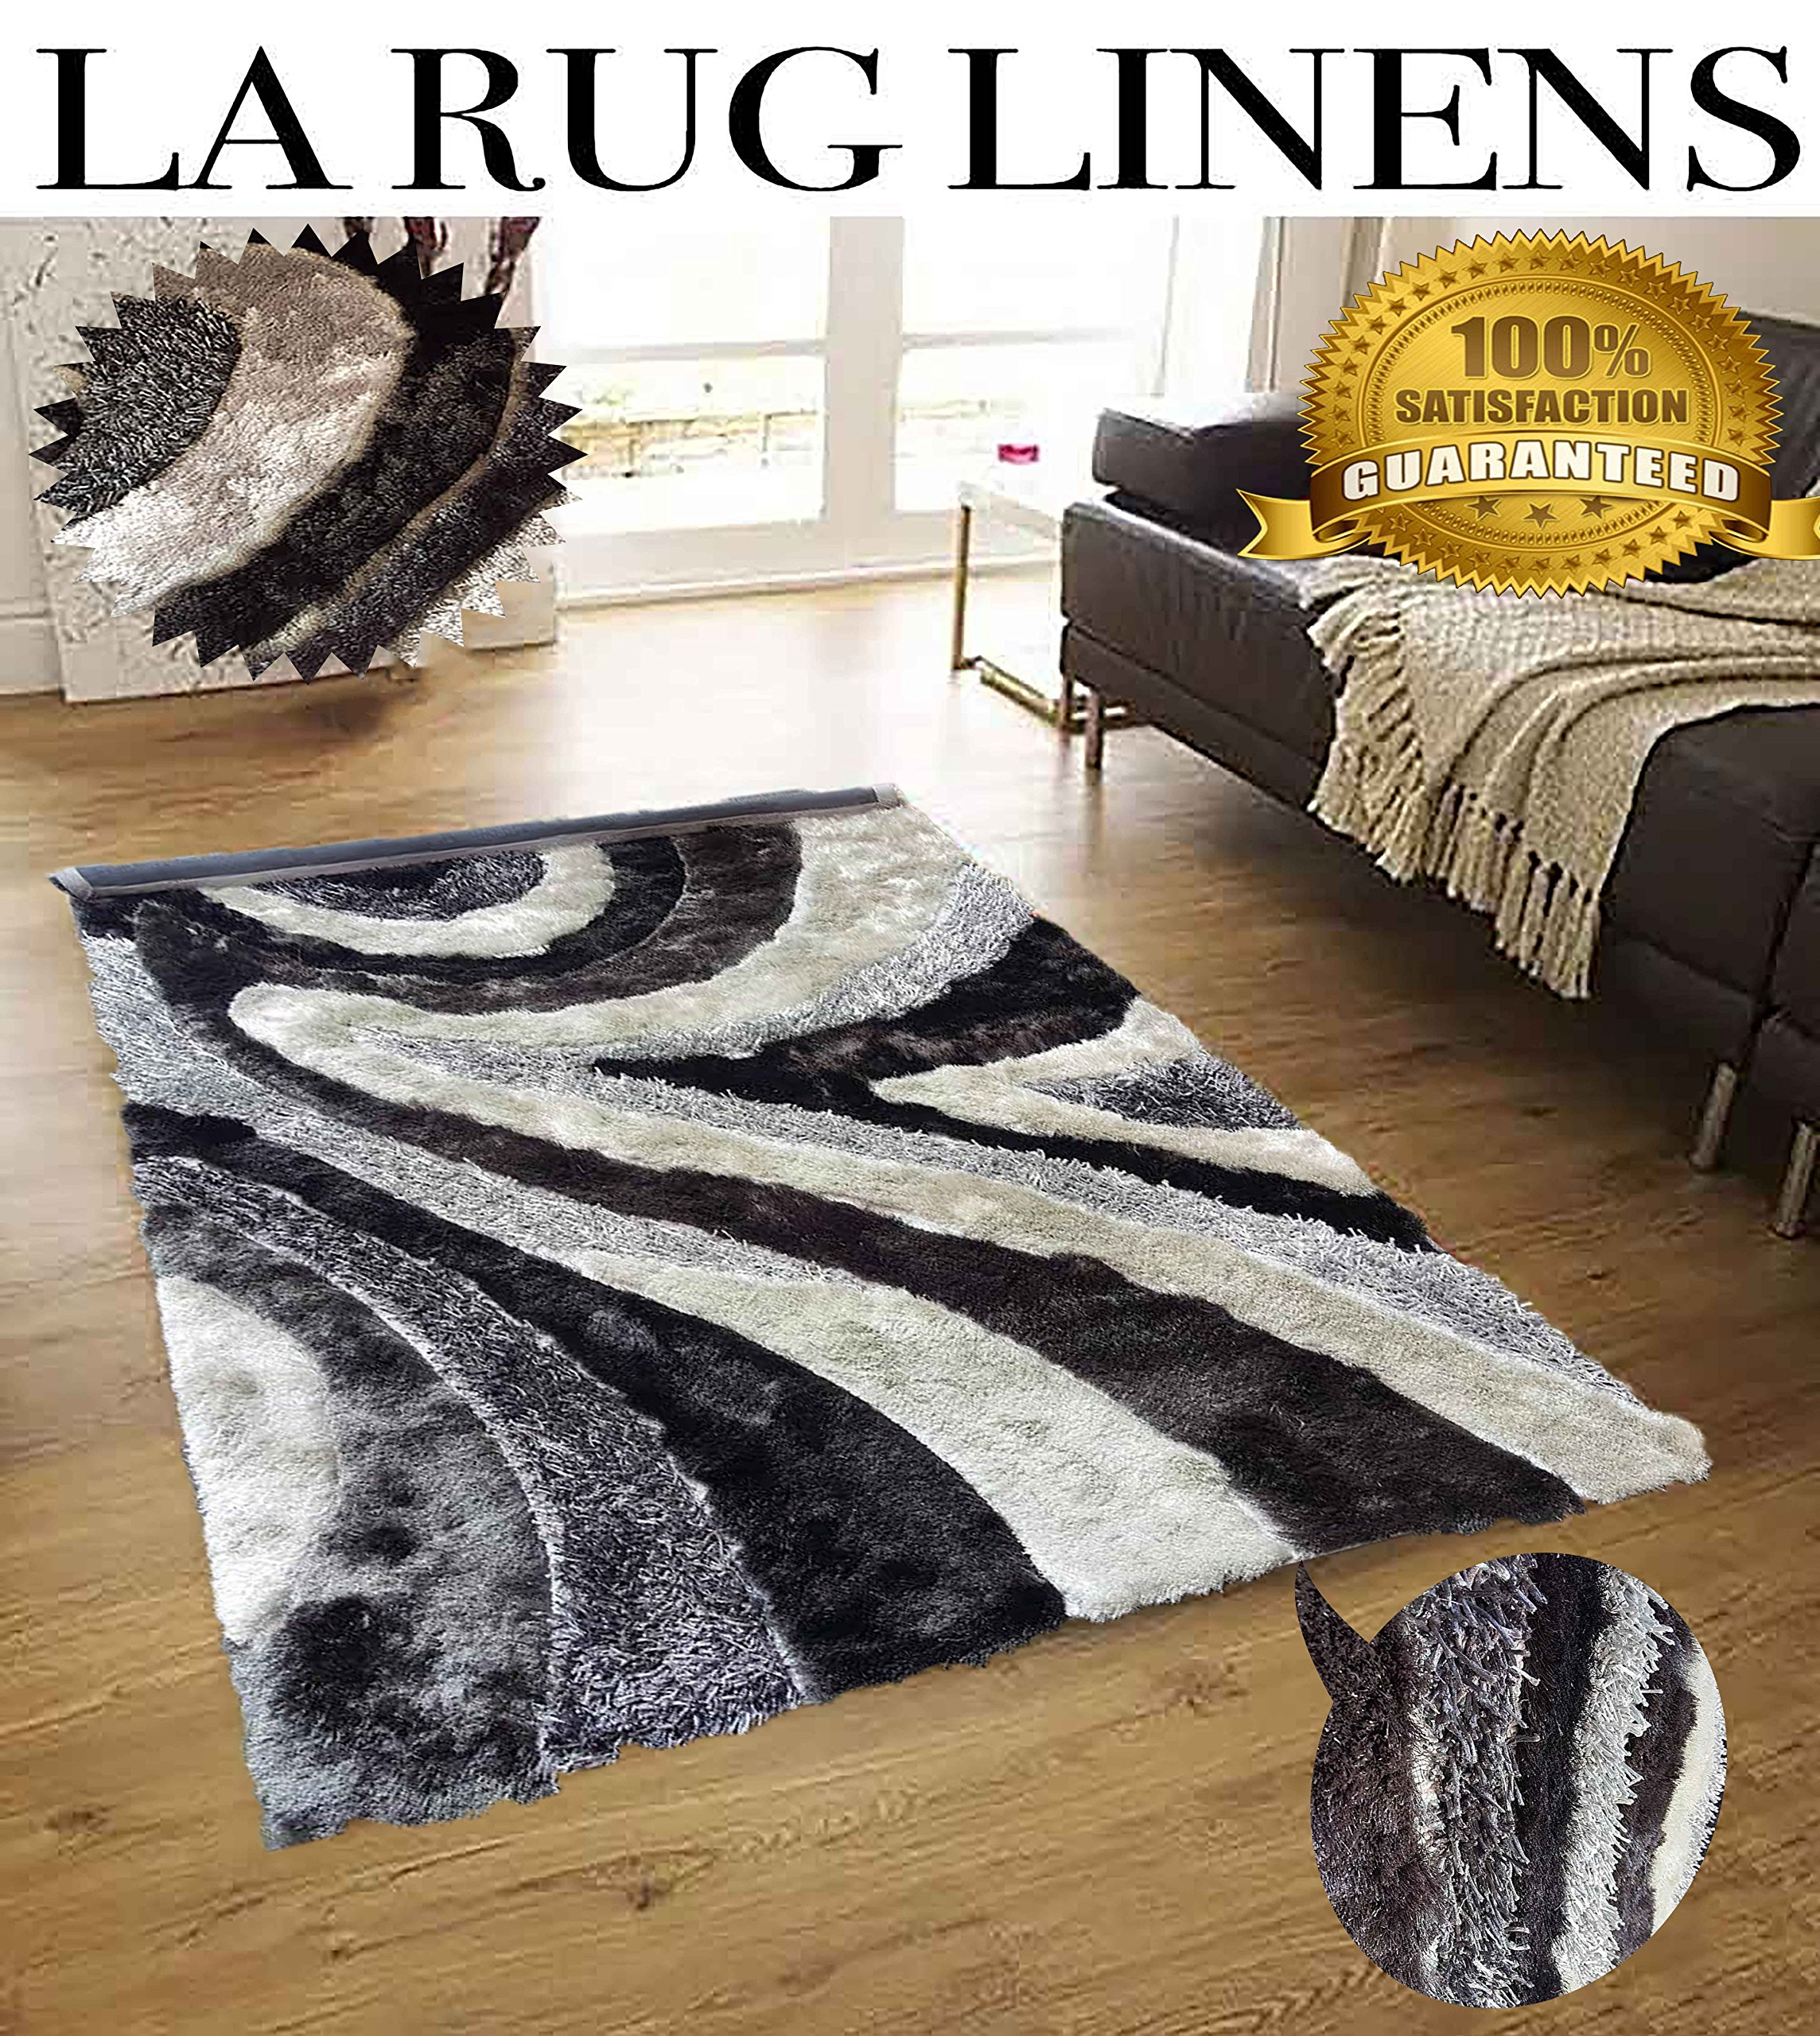 Buy La Rug Linens Dark Gray Light Gray Taupe Silver 8x10 Elegant